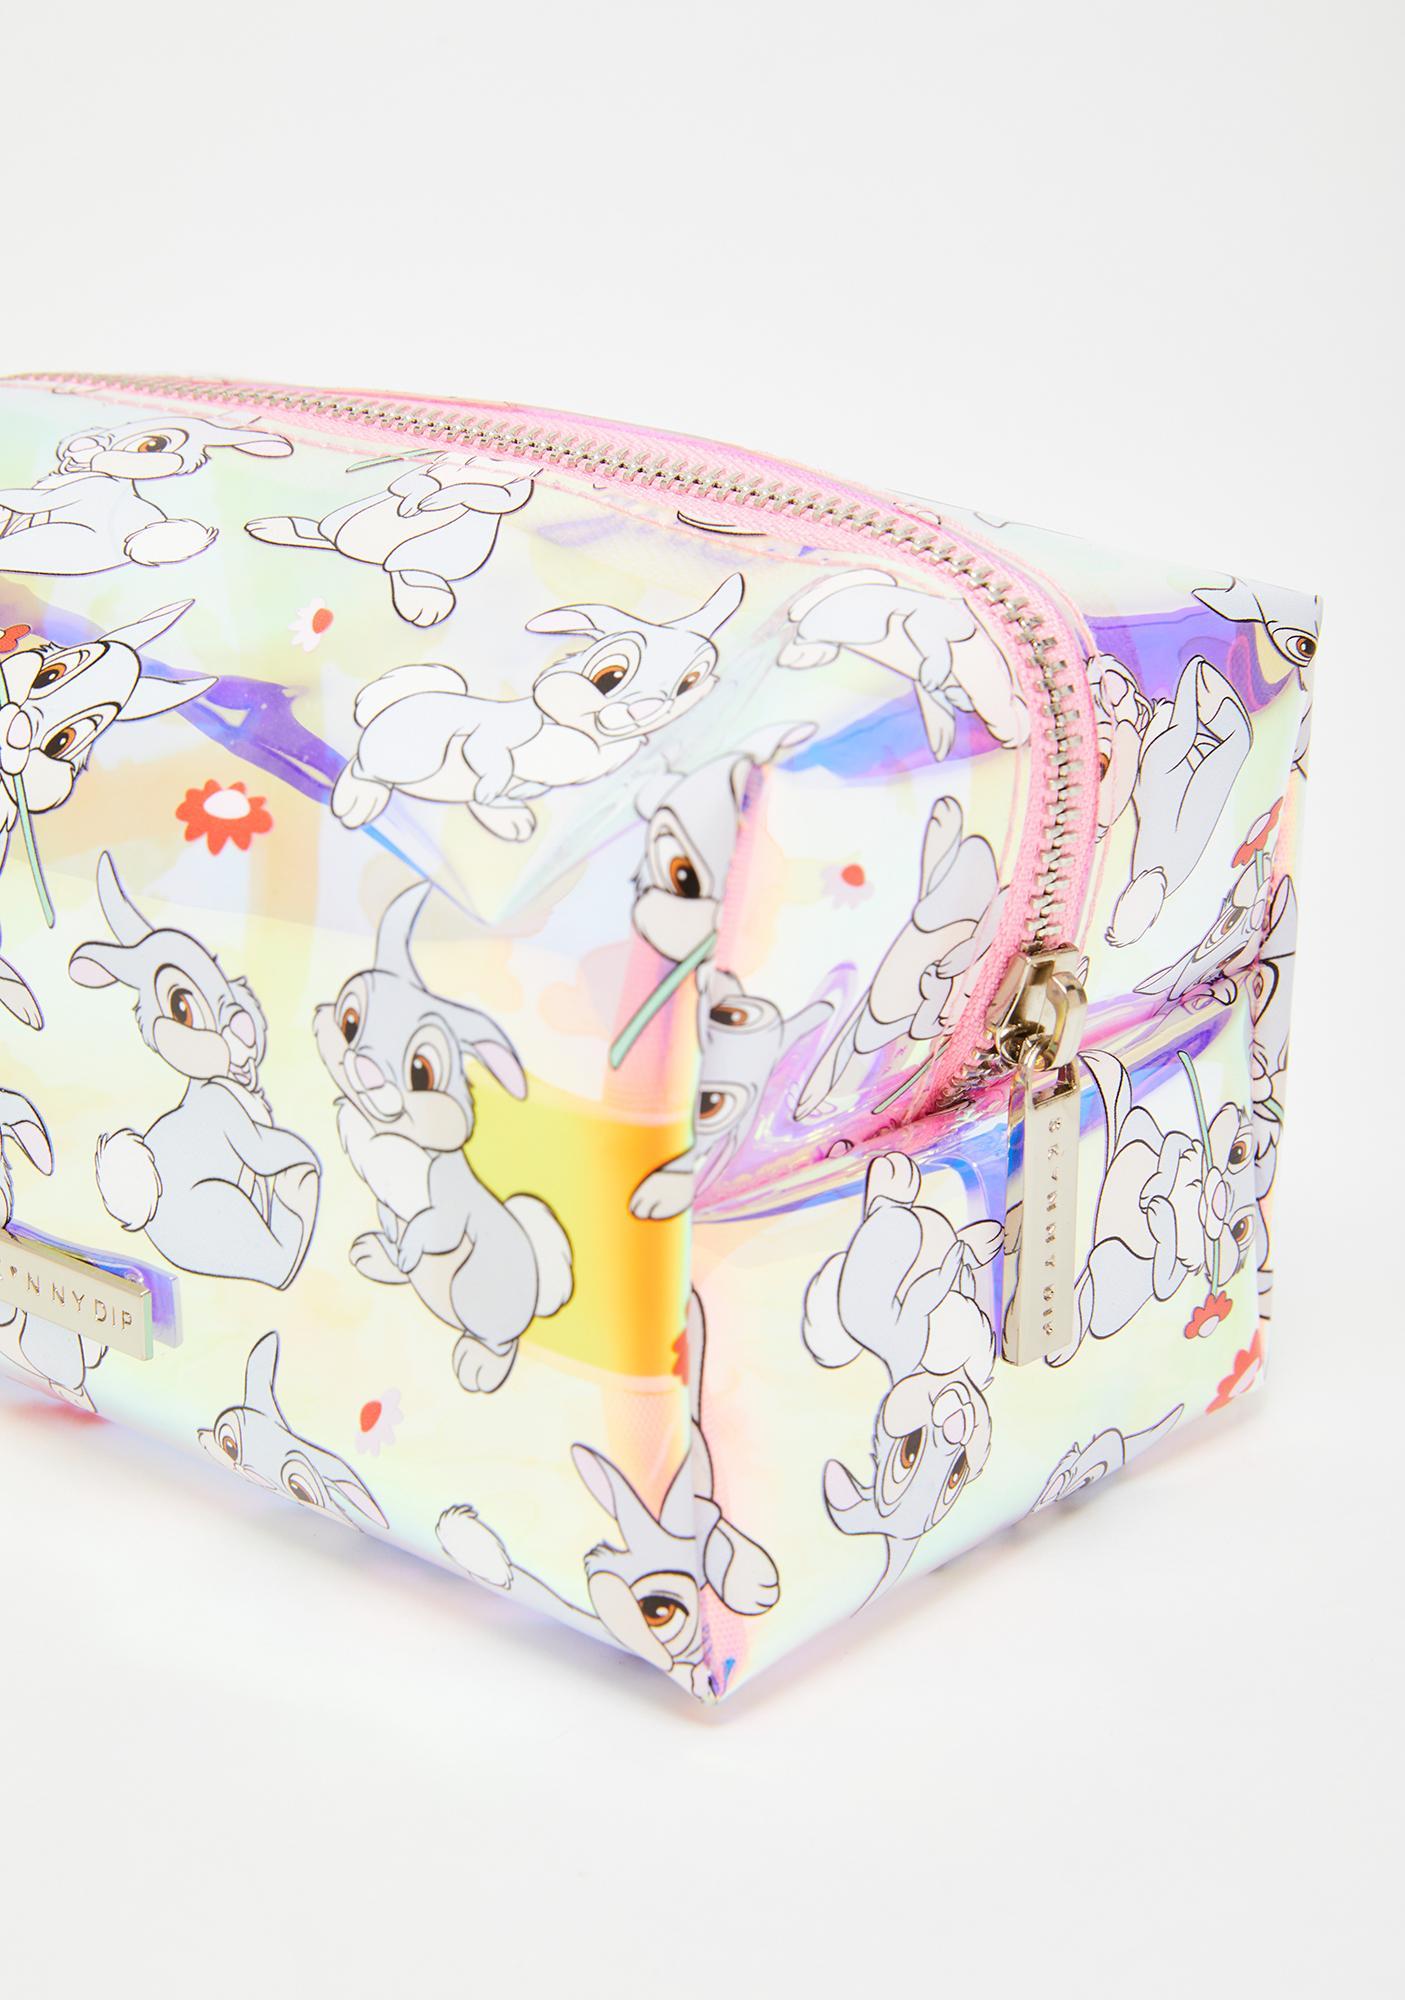 Skinnydip Disney X Skinnydip Thumper Makeup Bag